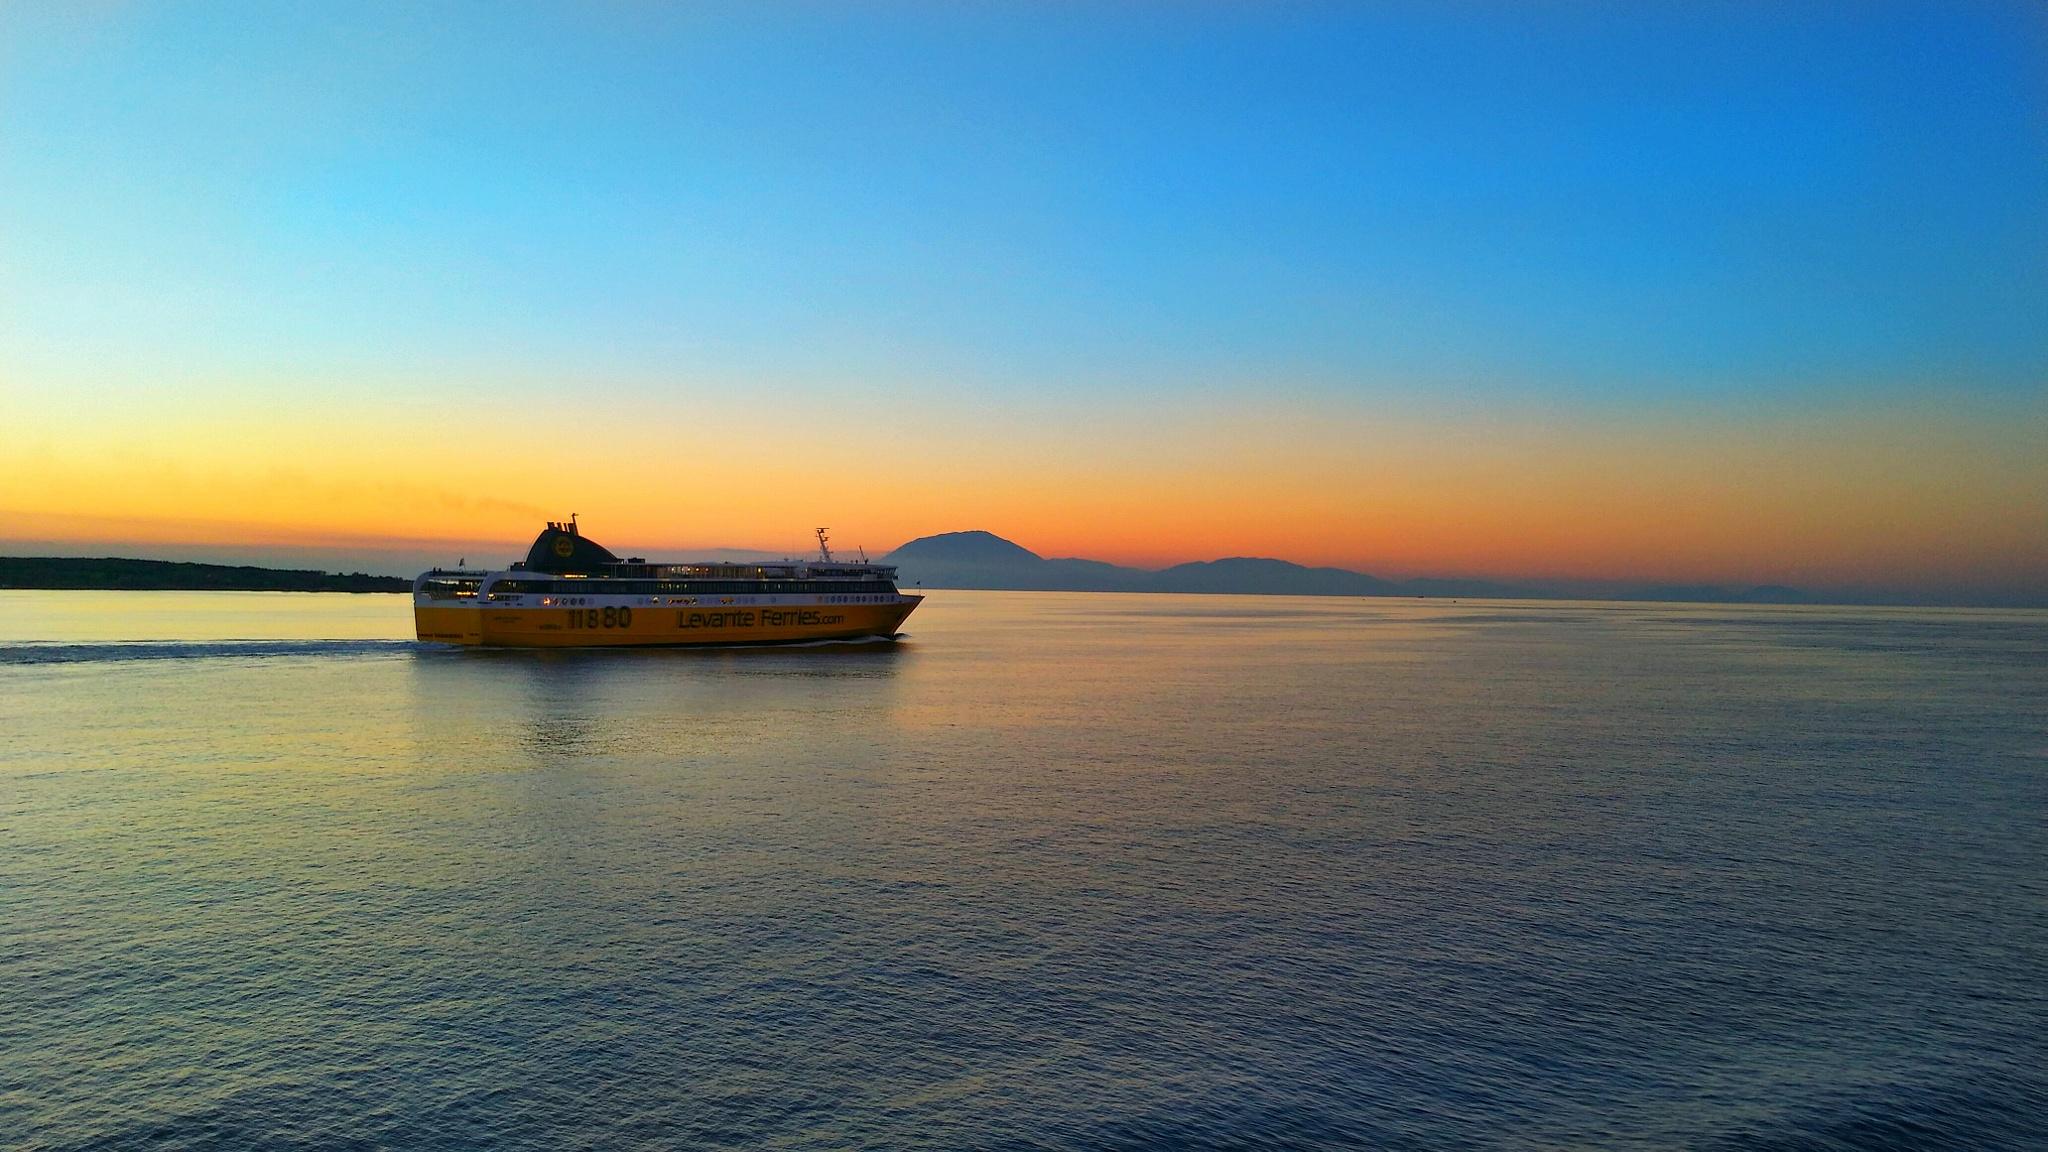 Ferry boat in sunset  by vasilis fragiskatos